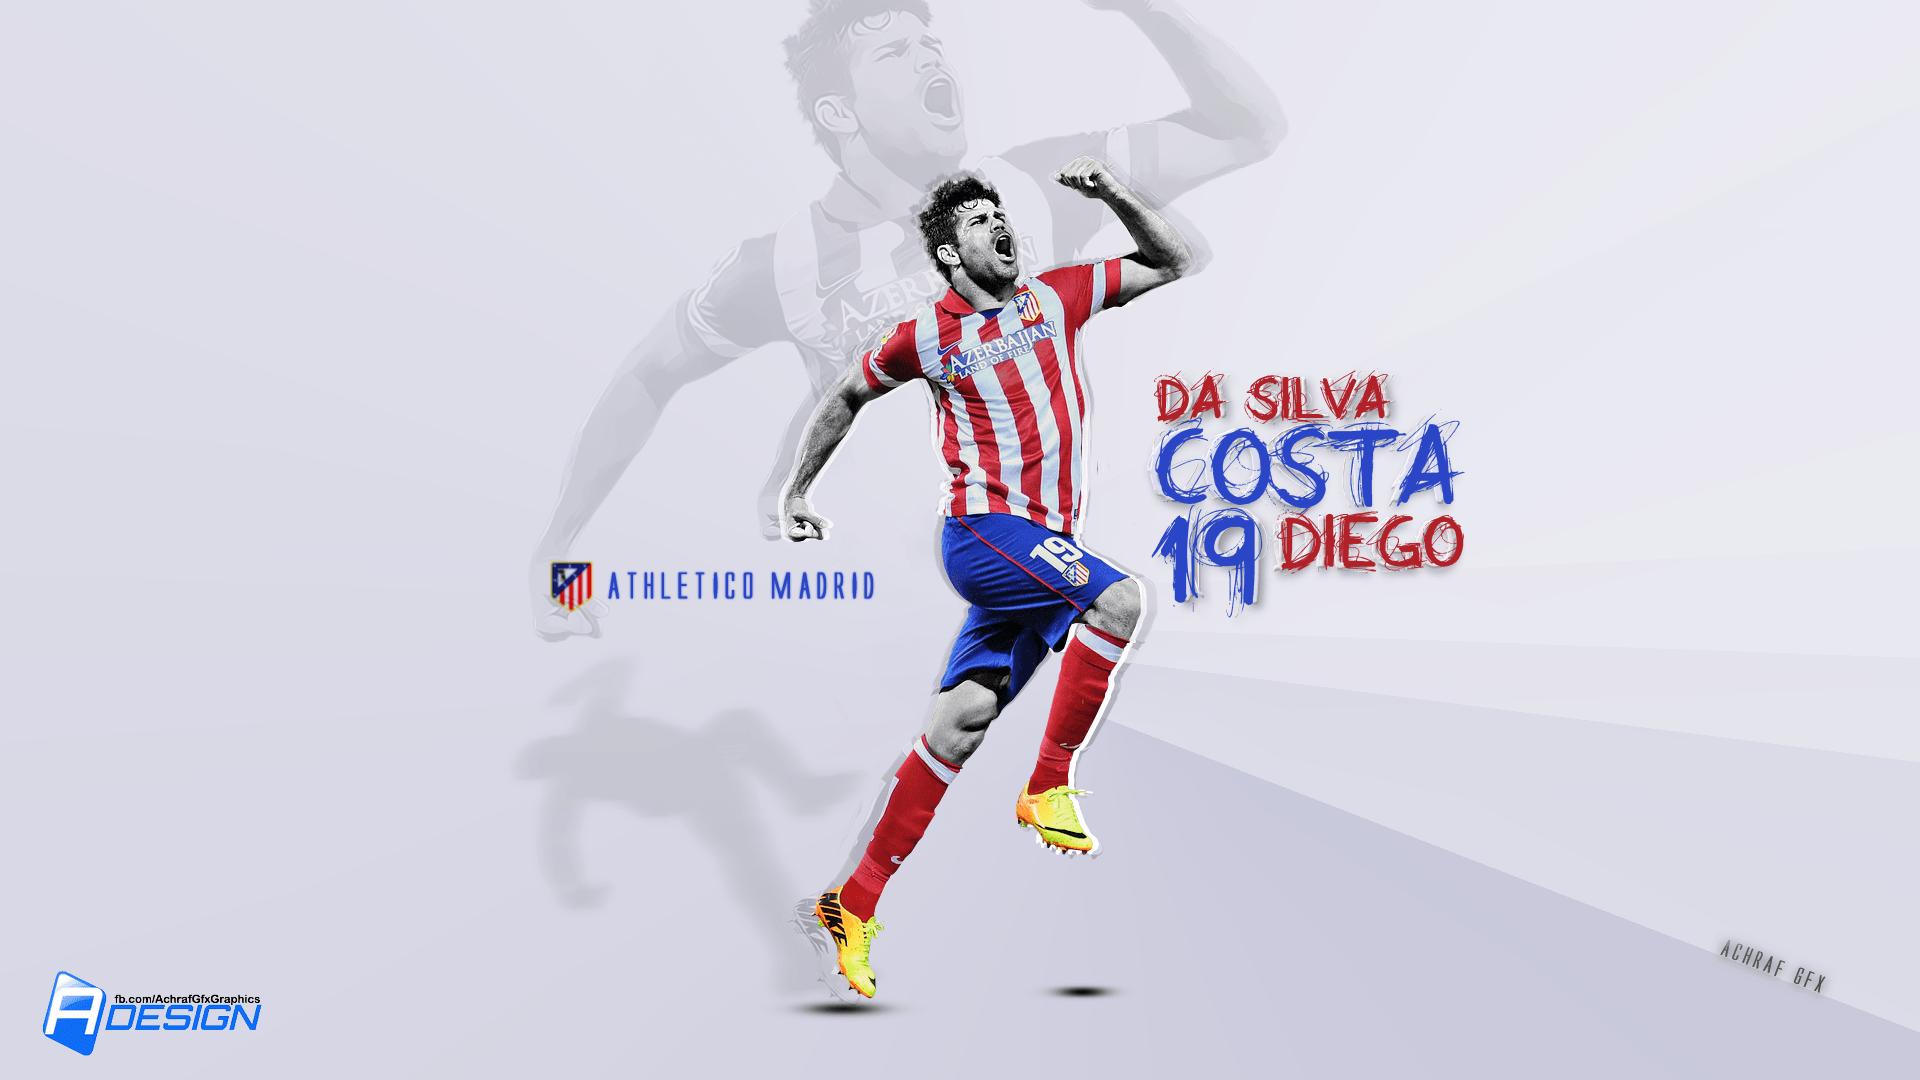 diego costa atletico madrid 2014 wallpaper | Desktop Backgrounds ...